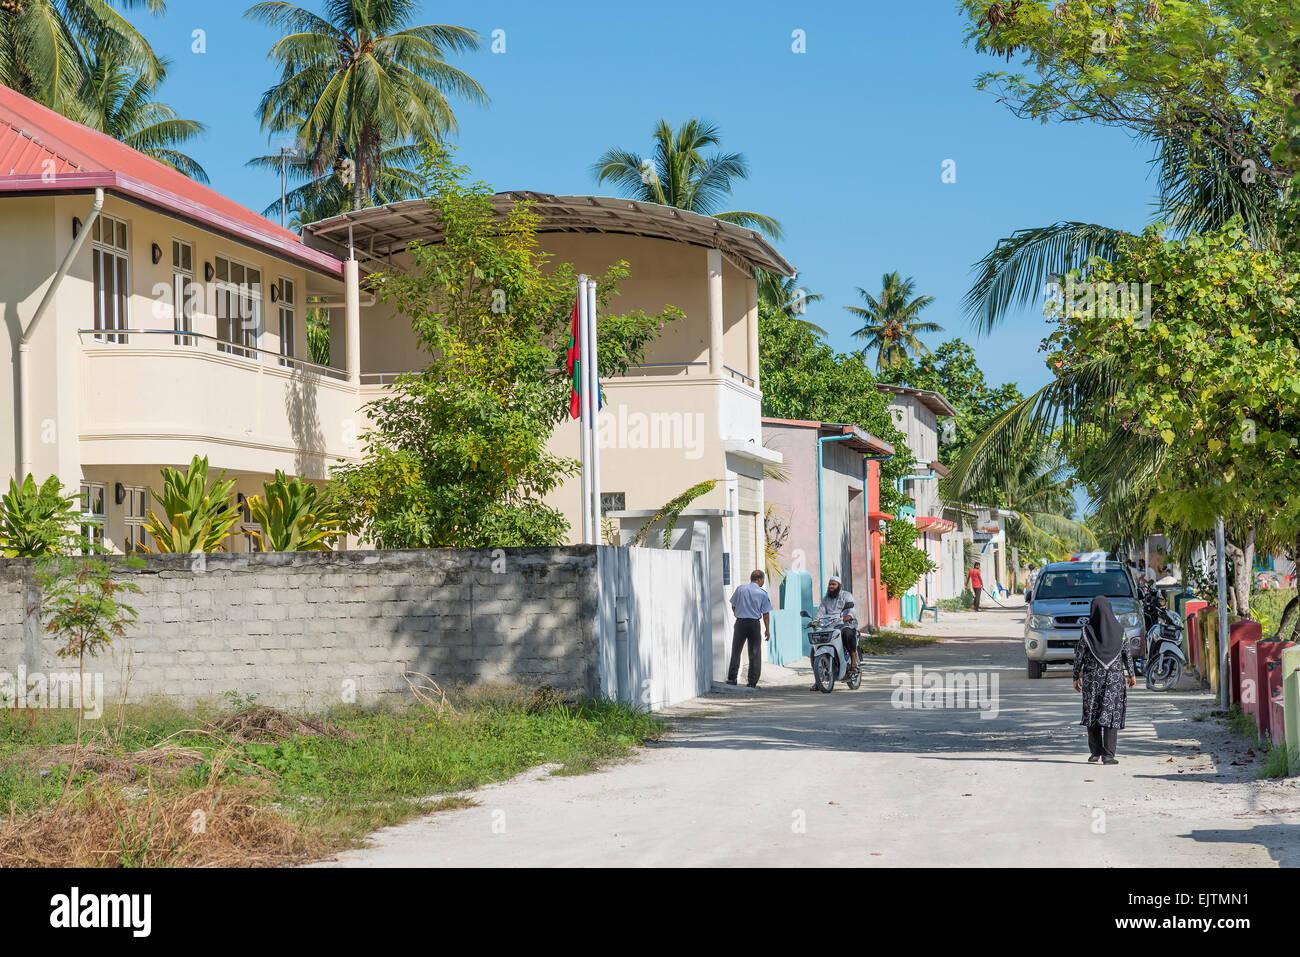 Maradhoo, Local Island in Addu Atoll, Maldives - Stock Image